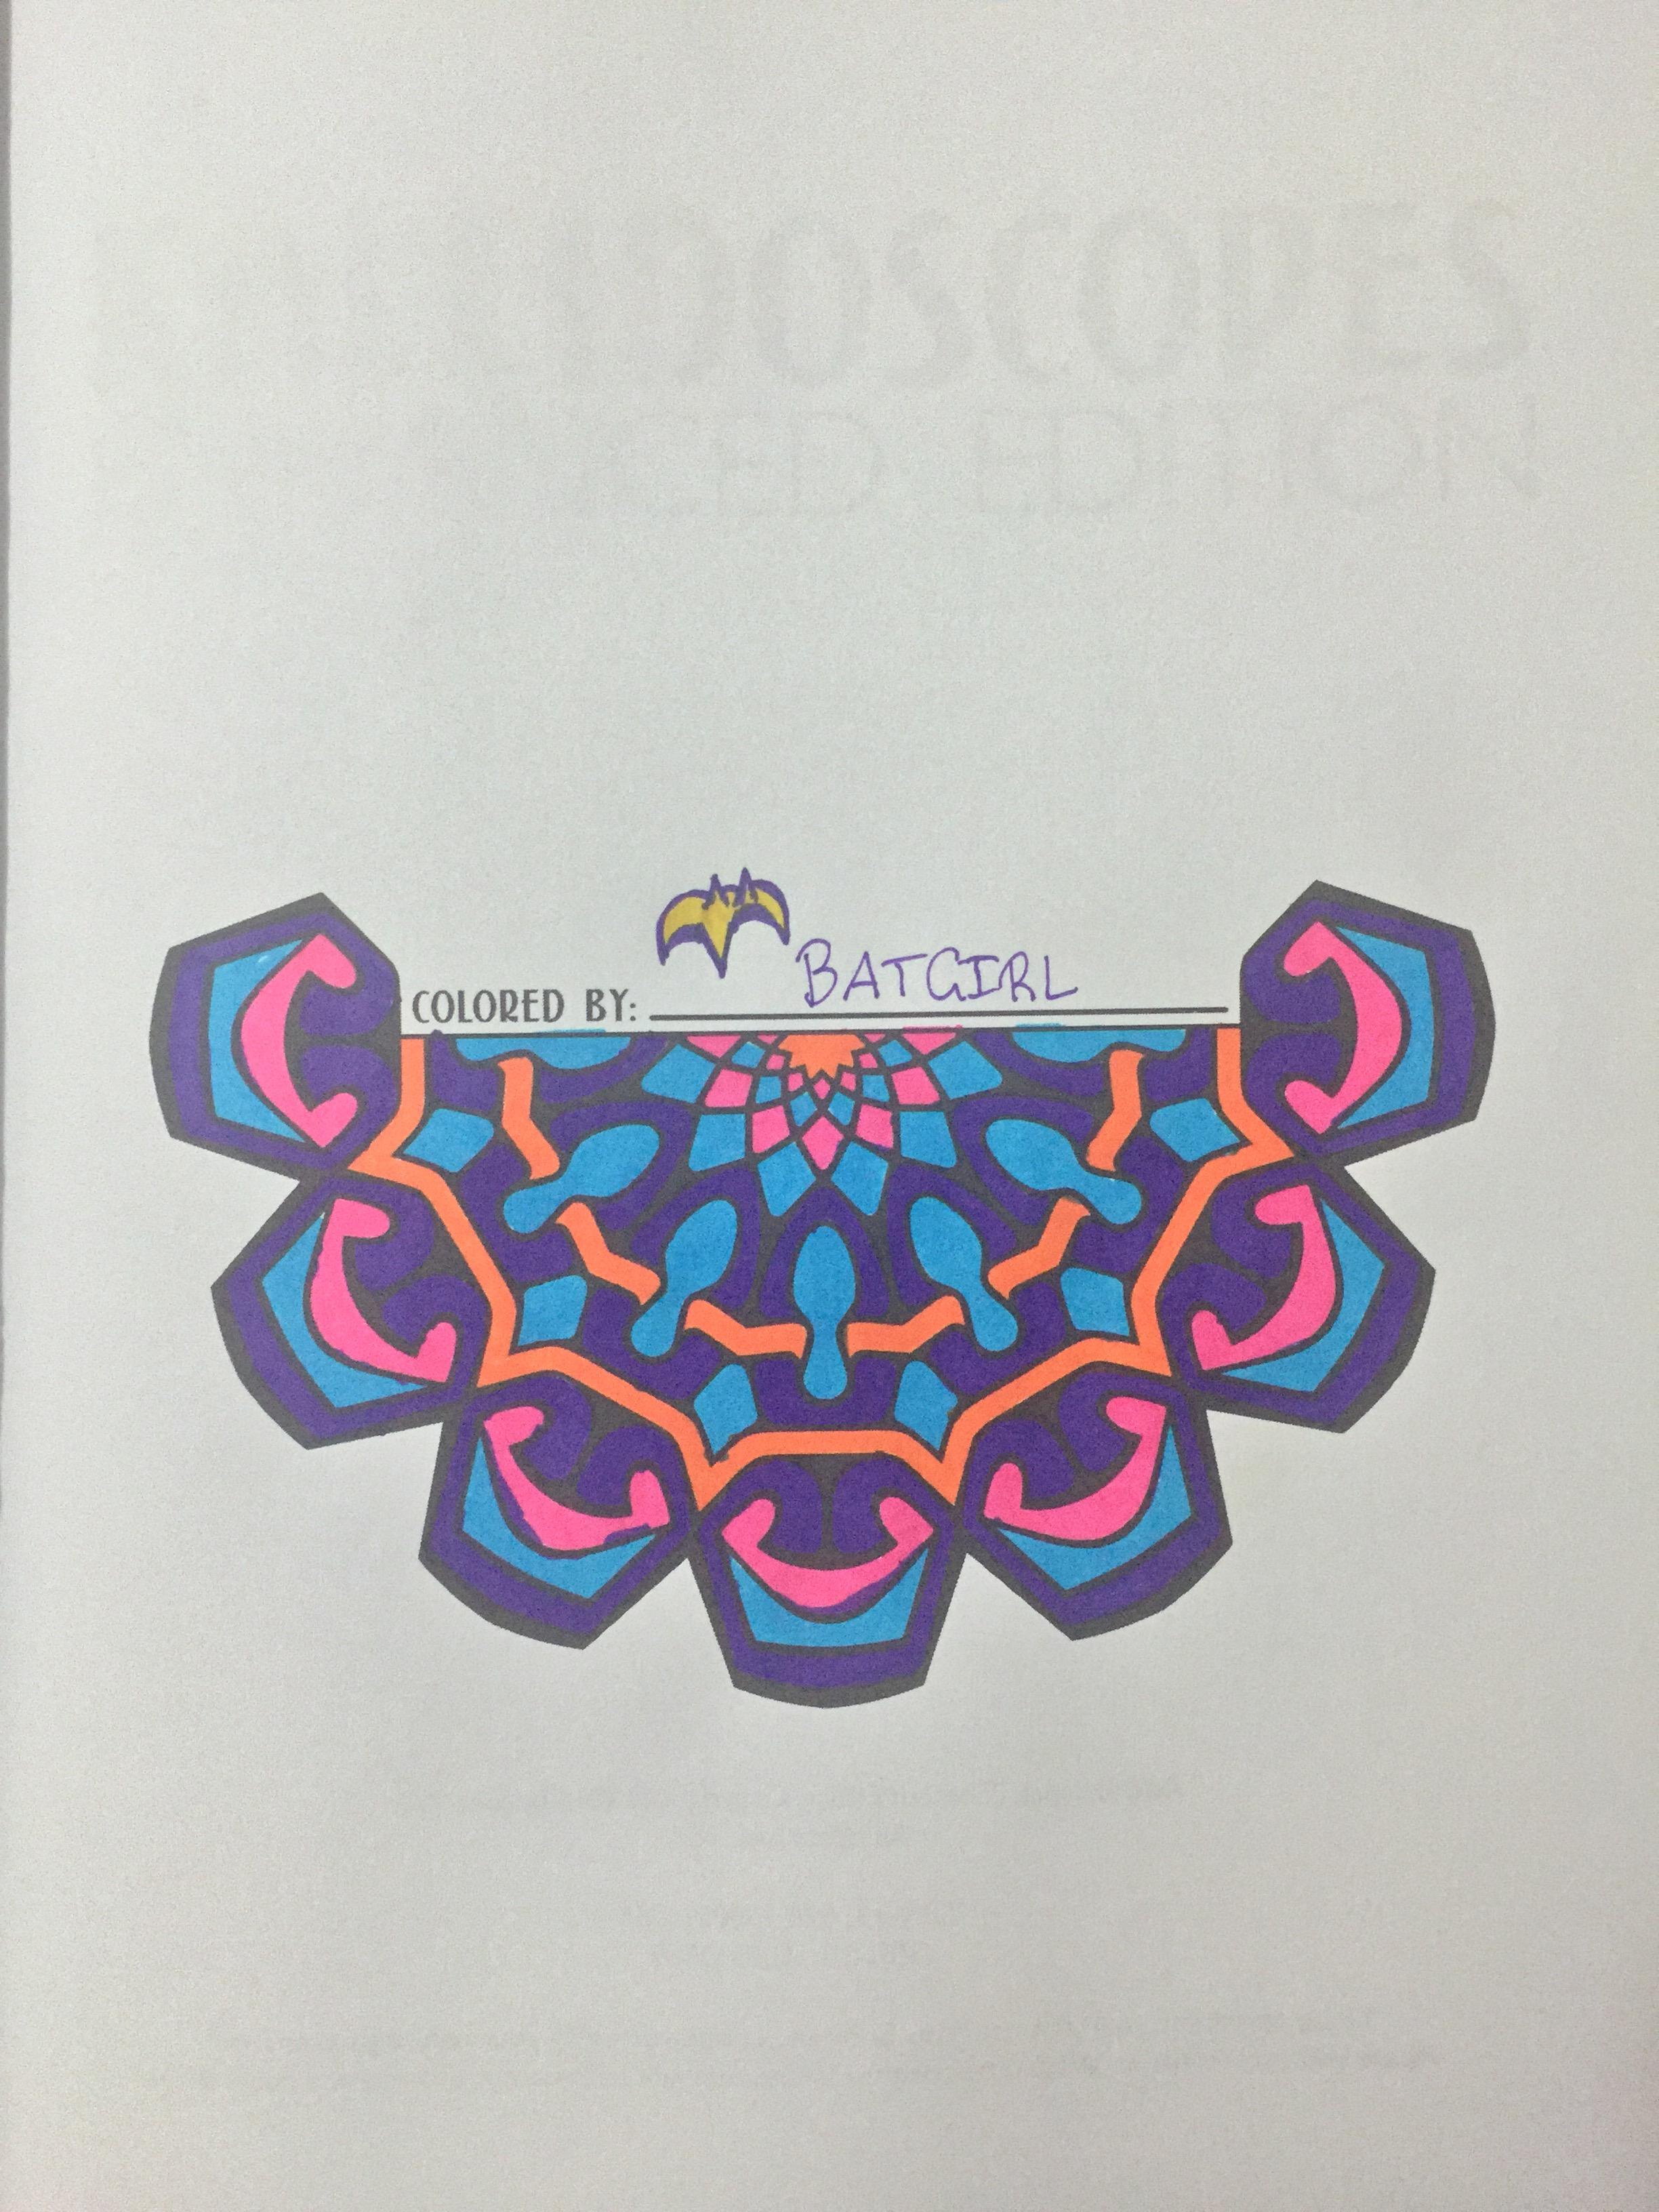 Colouring pencils for adults reviews - Colouring Pencils For Adults Reviews Geometric Coloring Adult Patterns Book Mandala Reviews Colour Pencils Art